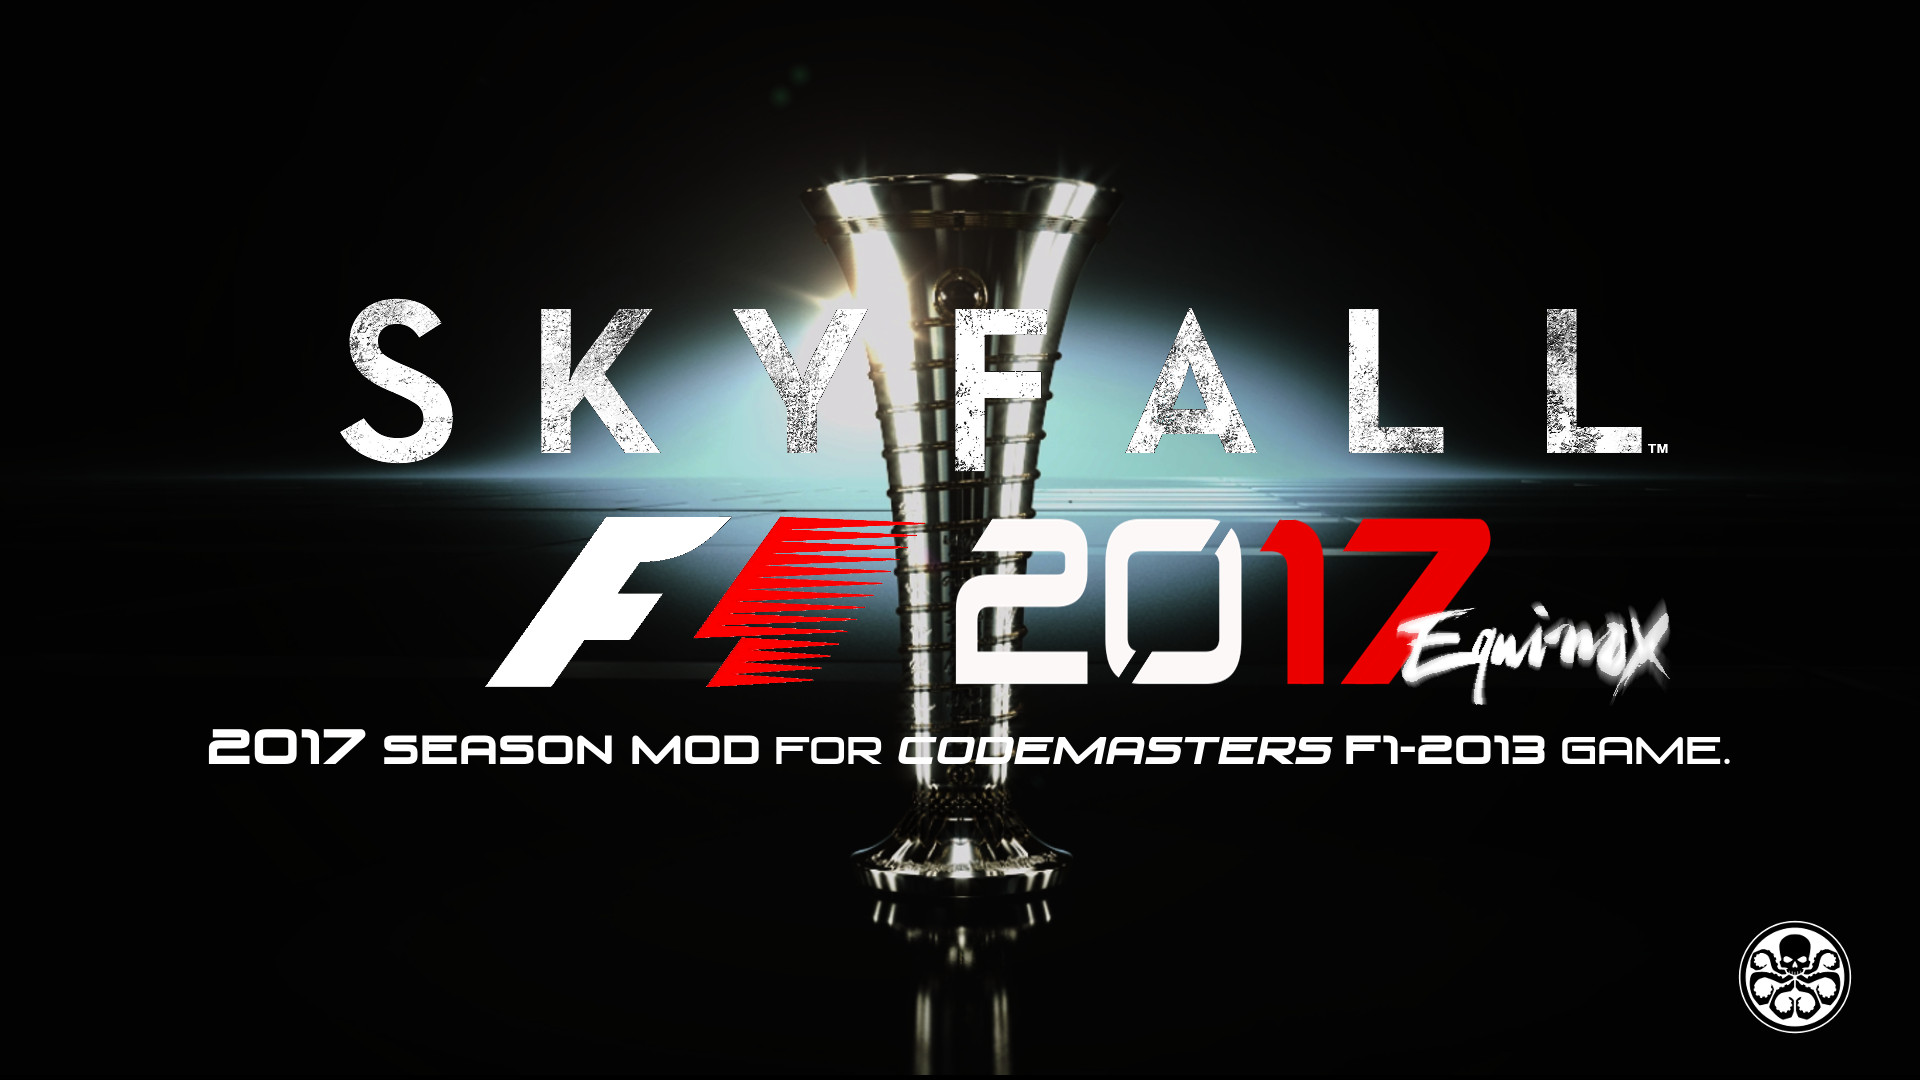 Skyfall 2017 Season MOD version 3.jpg